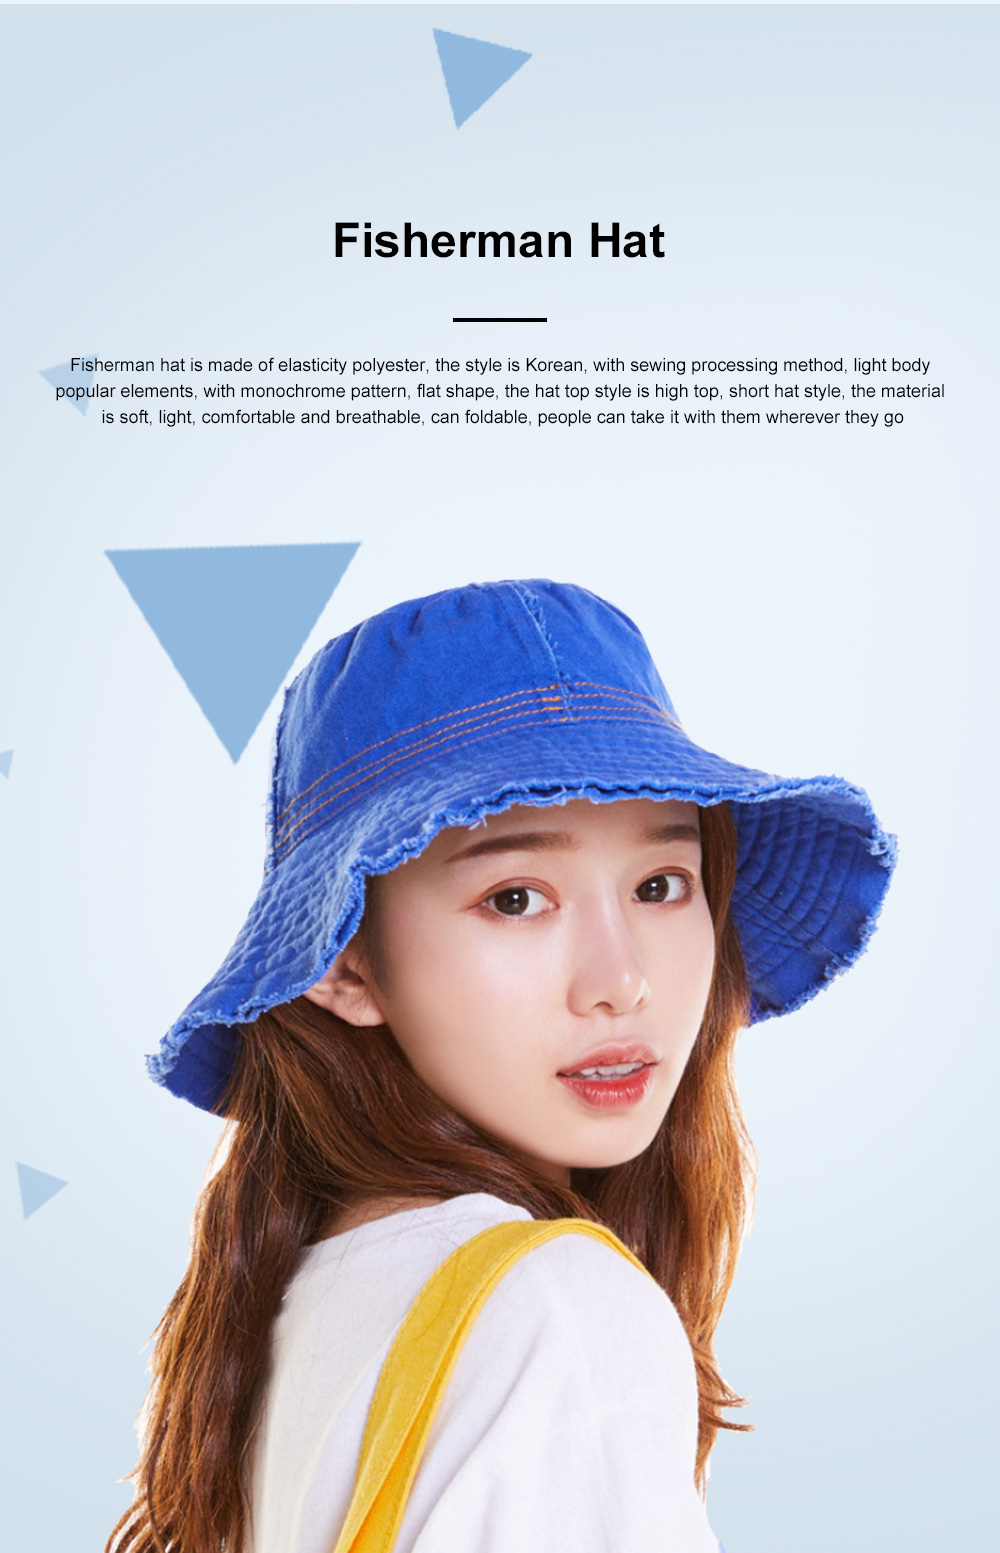 Japanese Hairline Cowboy Fisherman Hat Female Autumn Winter Sun Hat Personality Wild Hat Cap Folding Washable Cloth Cap 0